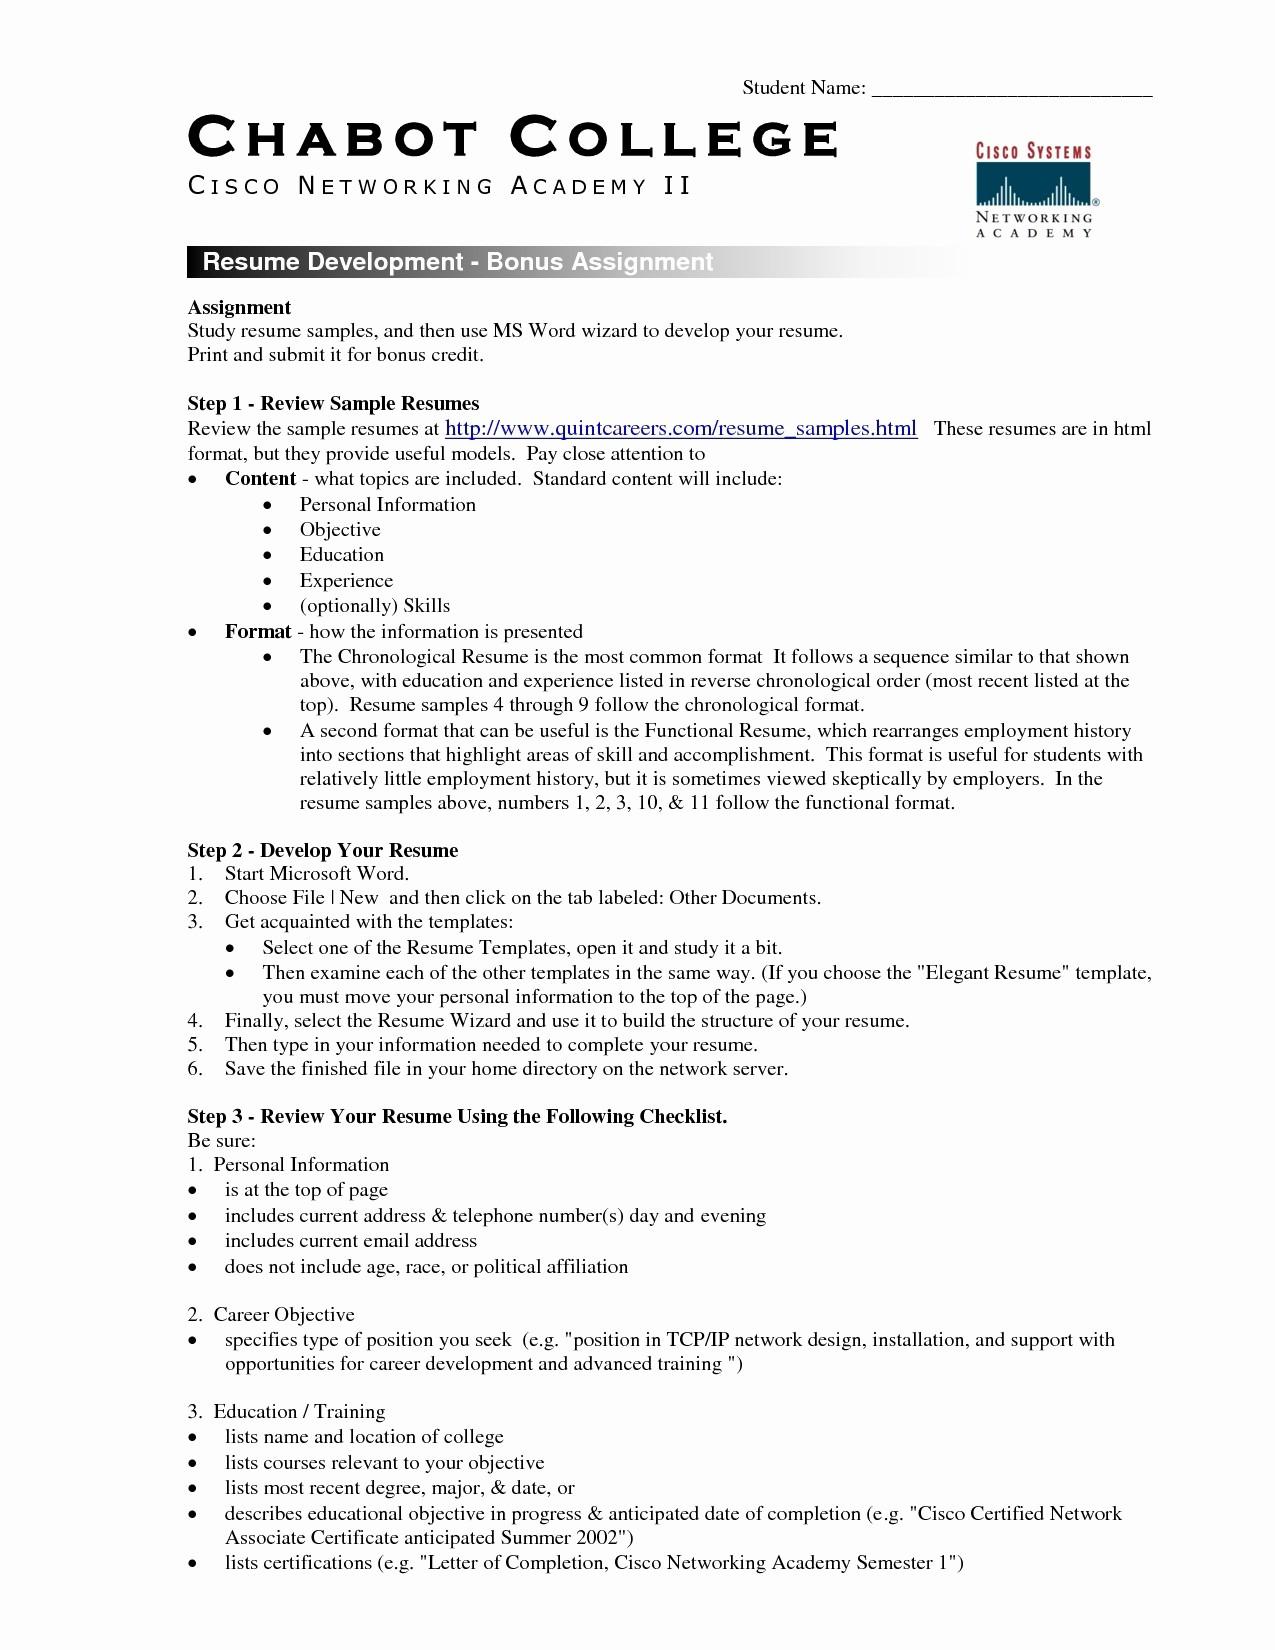 Microsoft Word Templates for Mac Inspirational Resume Template Microsoft Word 2017